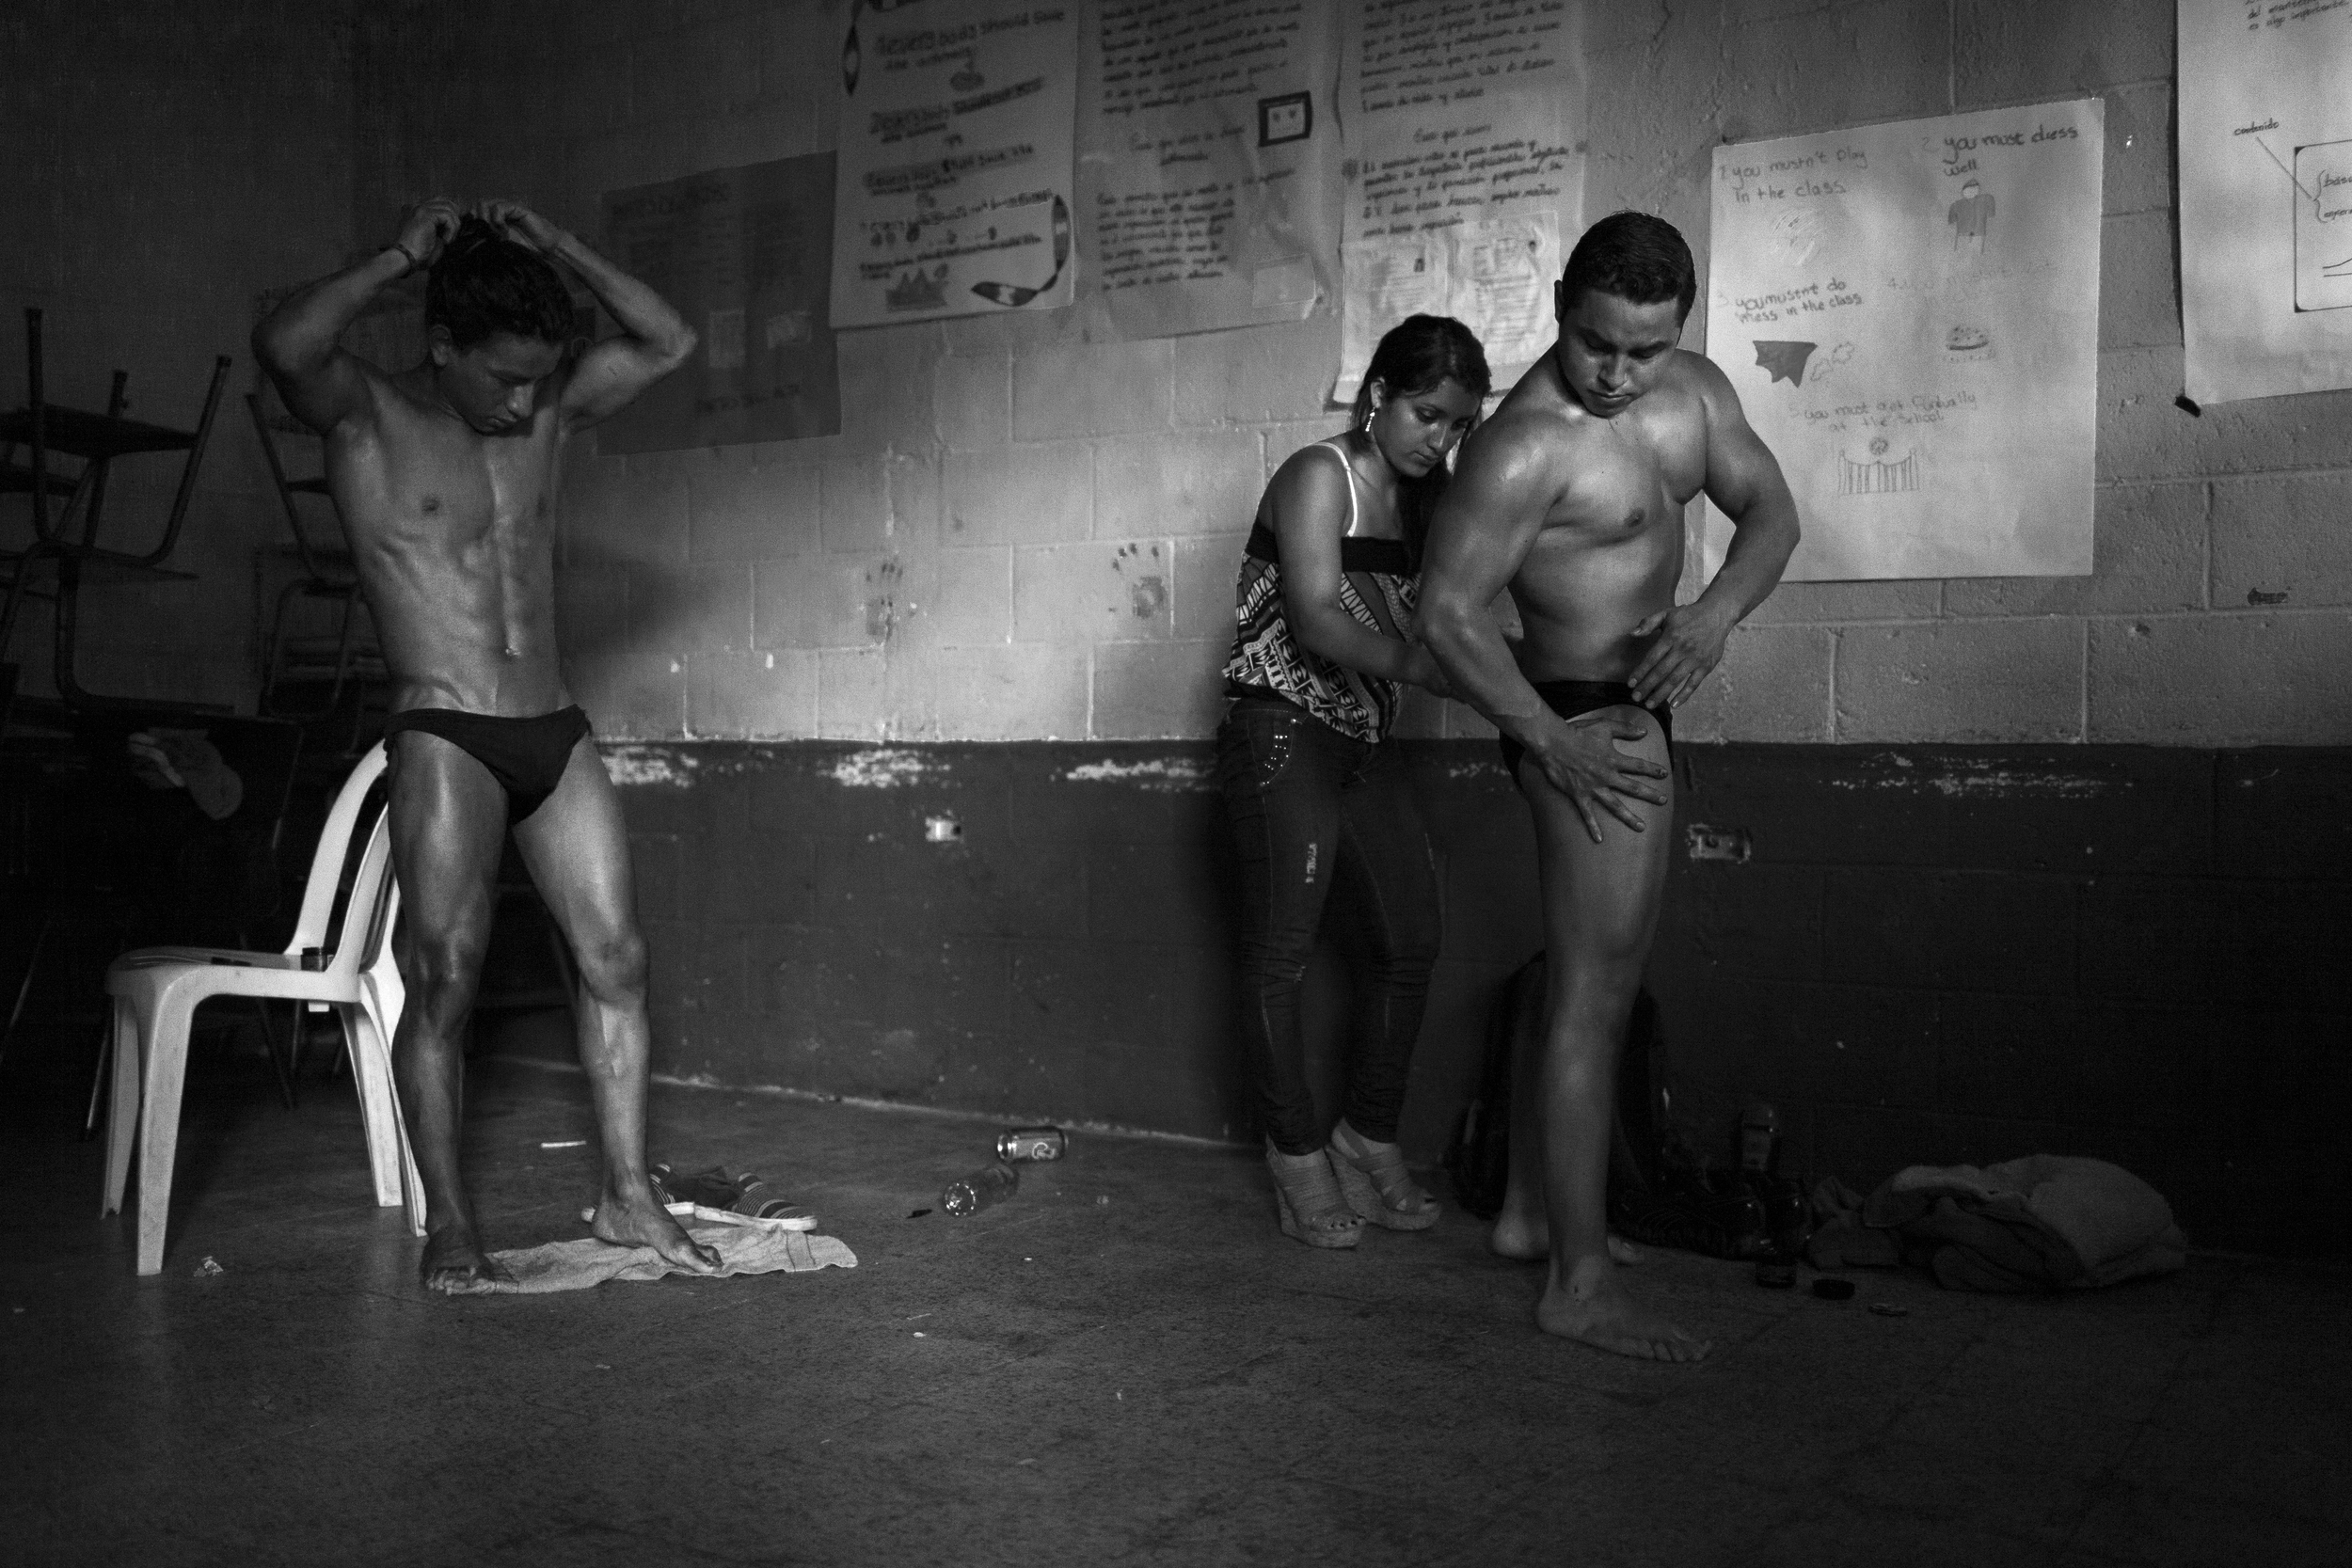 Competitors have help applying bronzer before the Gimnasio La Fábrica bodybuilding contest in Antigua, Guatemala.